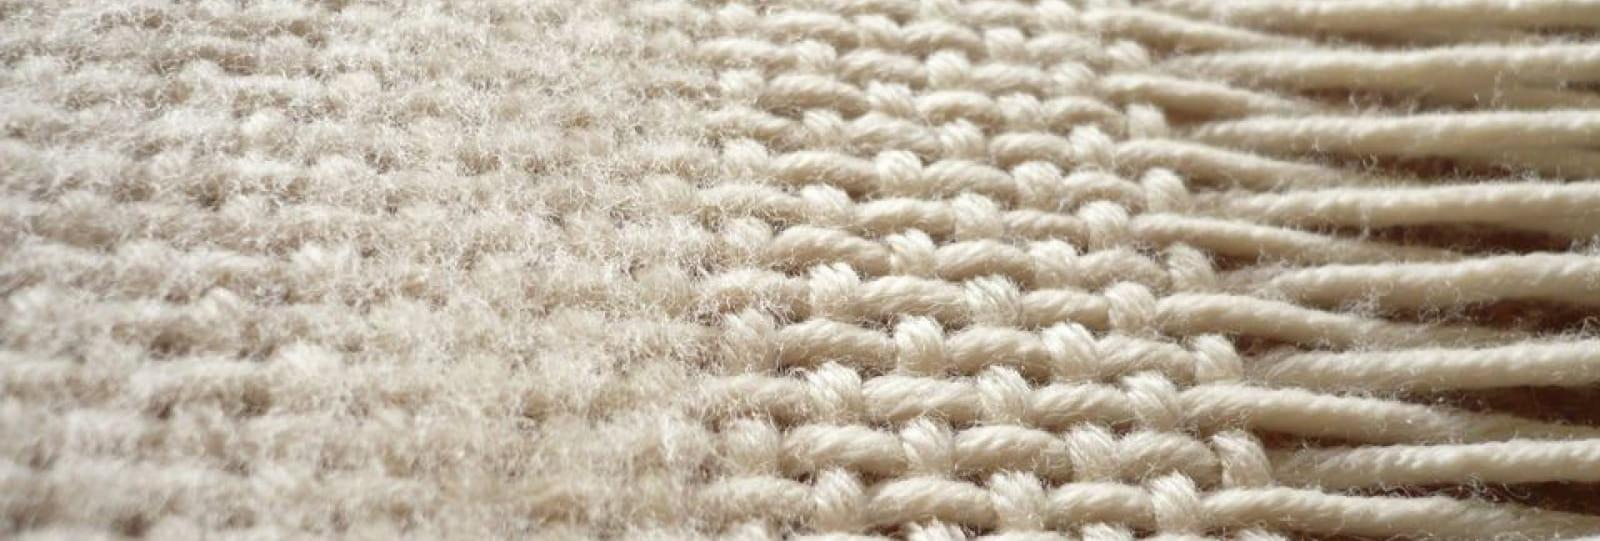 Stage de tissage et filage - Inkle loom 1 : toile simple